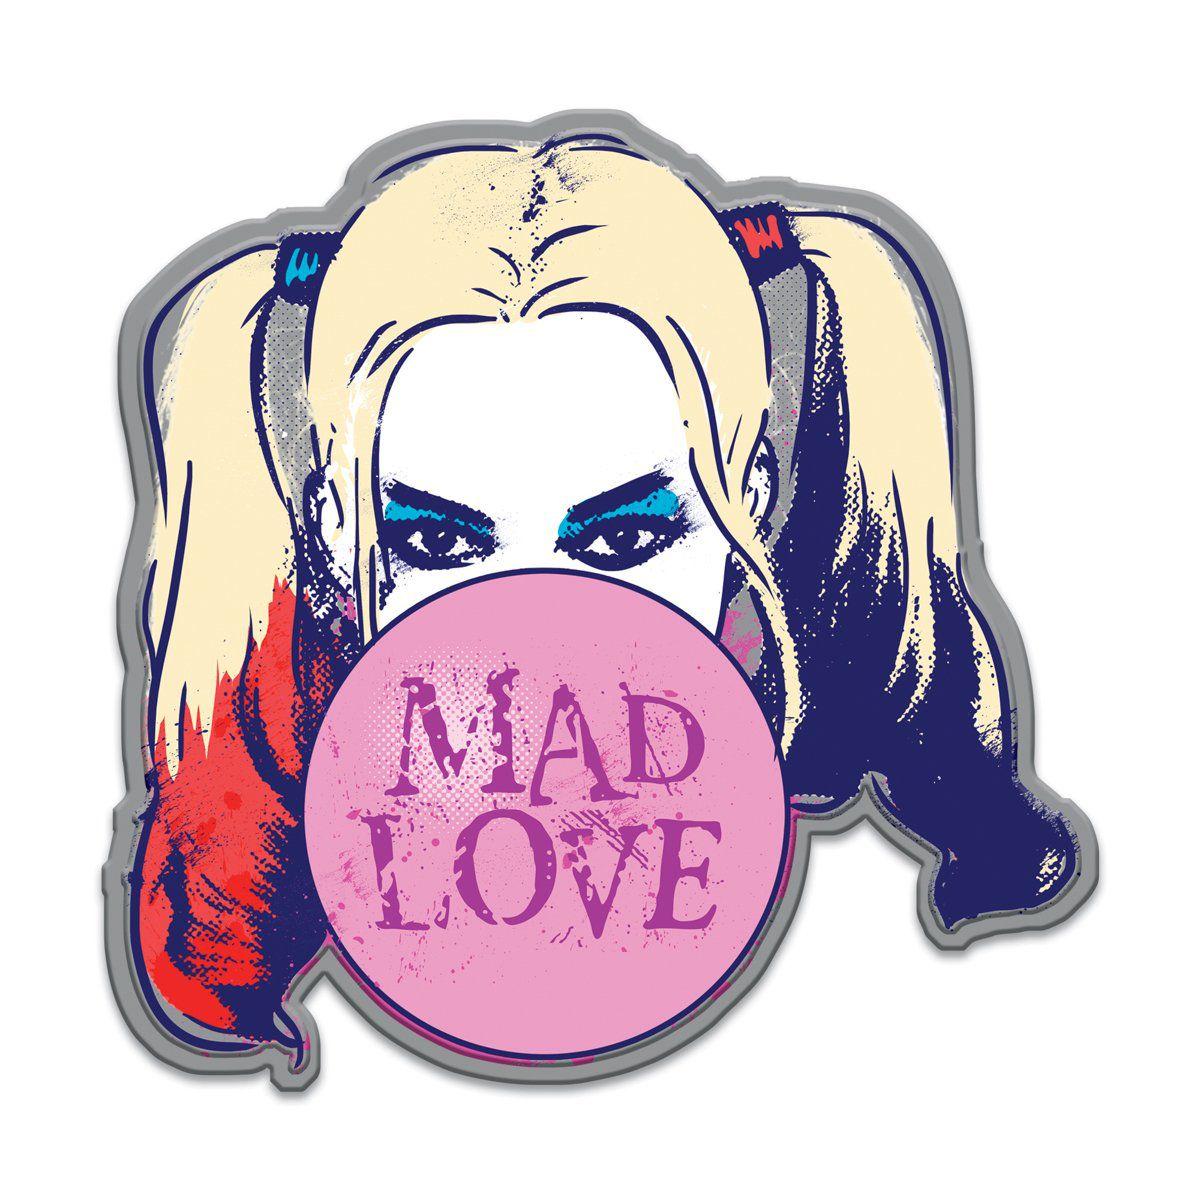 Placa Decorativa Arlequina (Harley Quinn) :